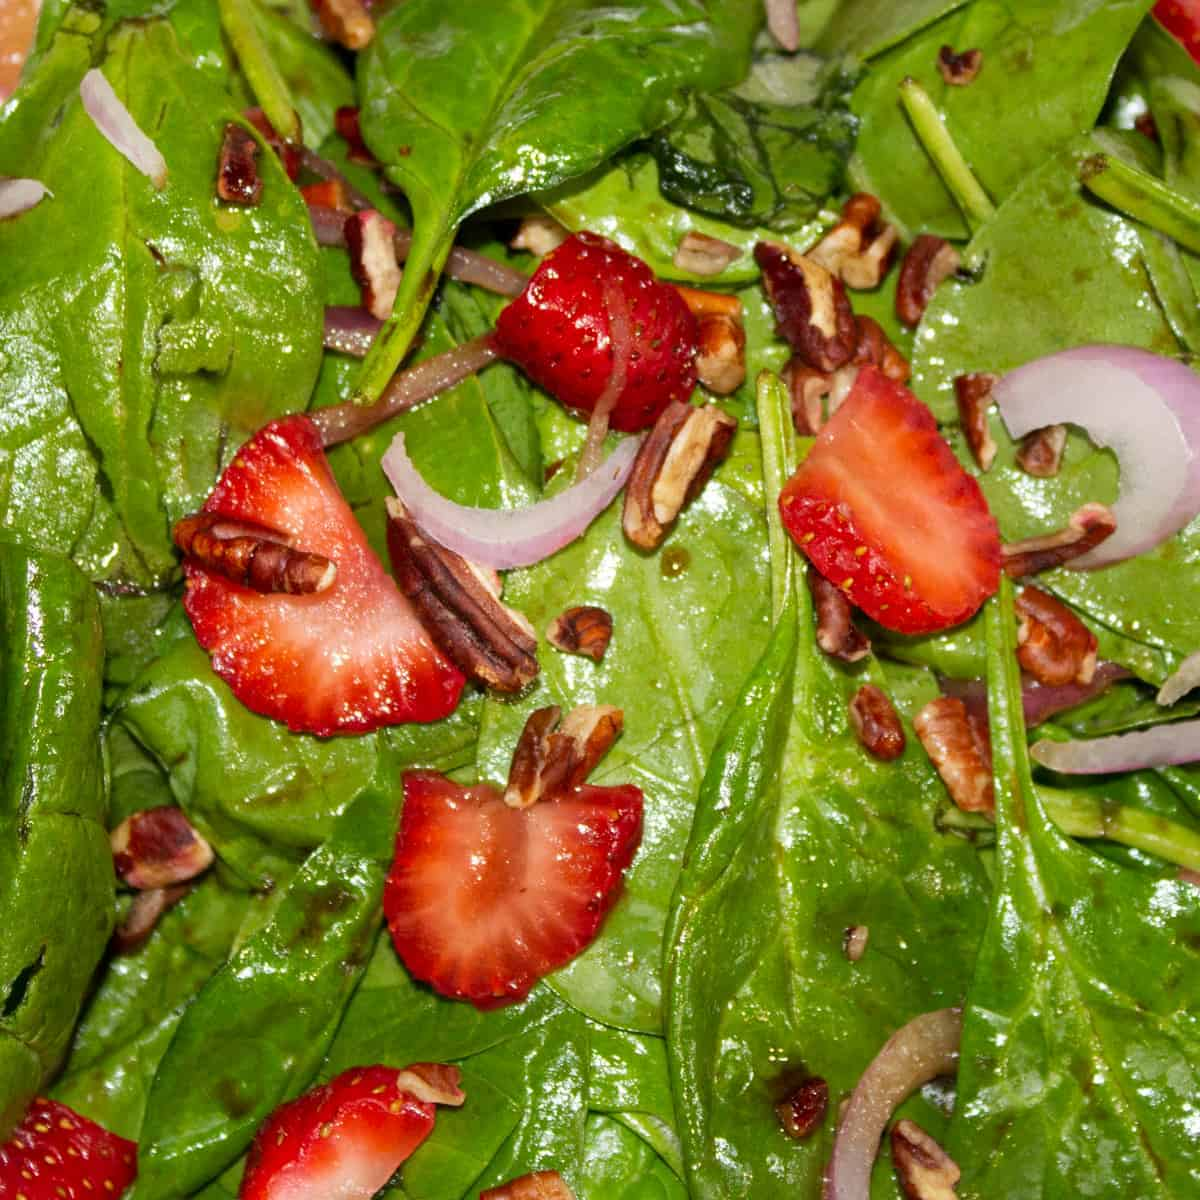 strawberry salad close up